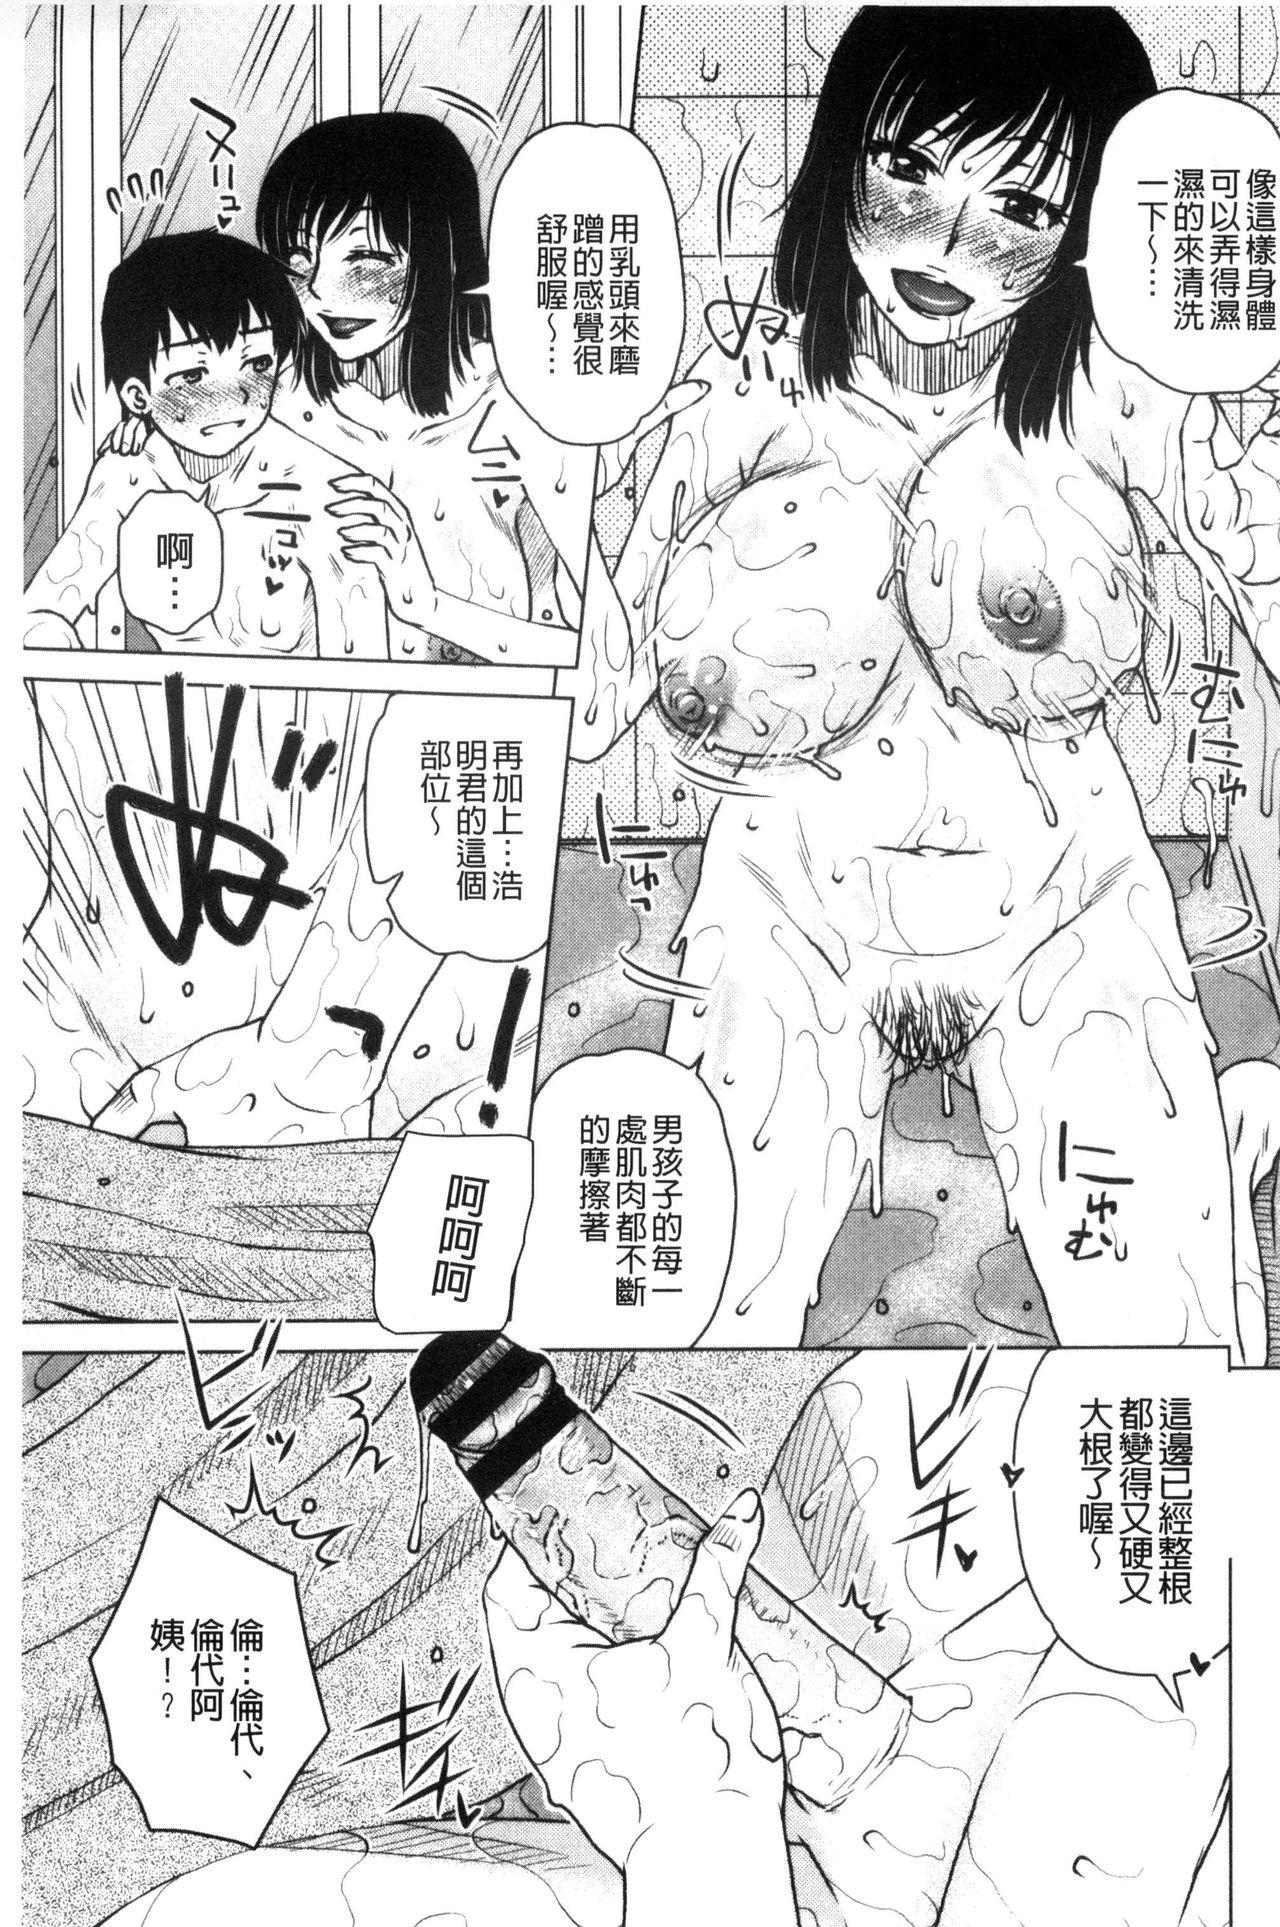 [Kurumiya Mashimin] Uchi no Shachou no Hamedere Inkatsu - Our President is HAME-DERE in Licentious sex life. [Chinese] 111